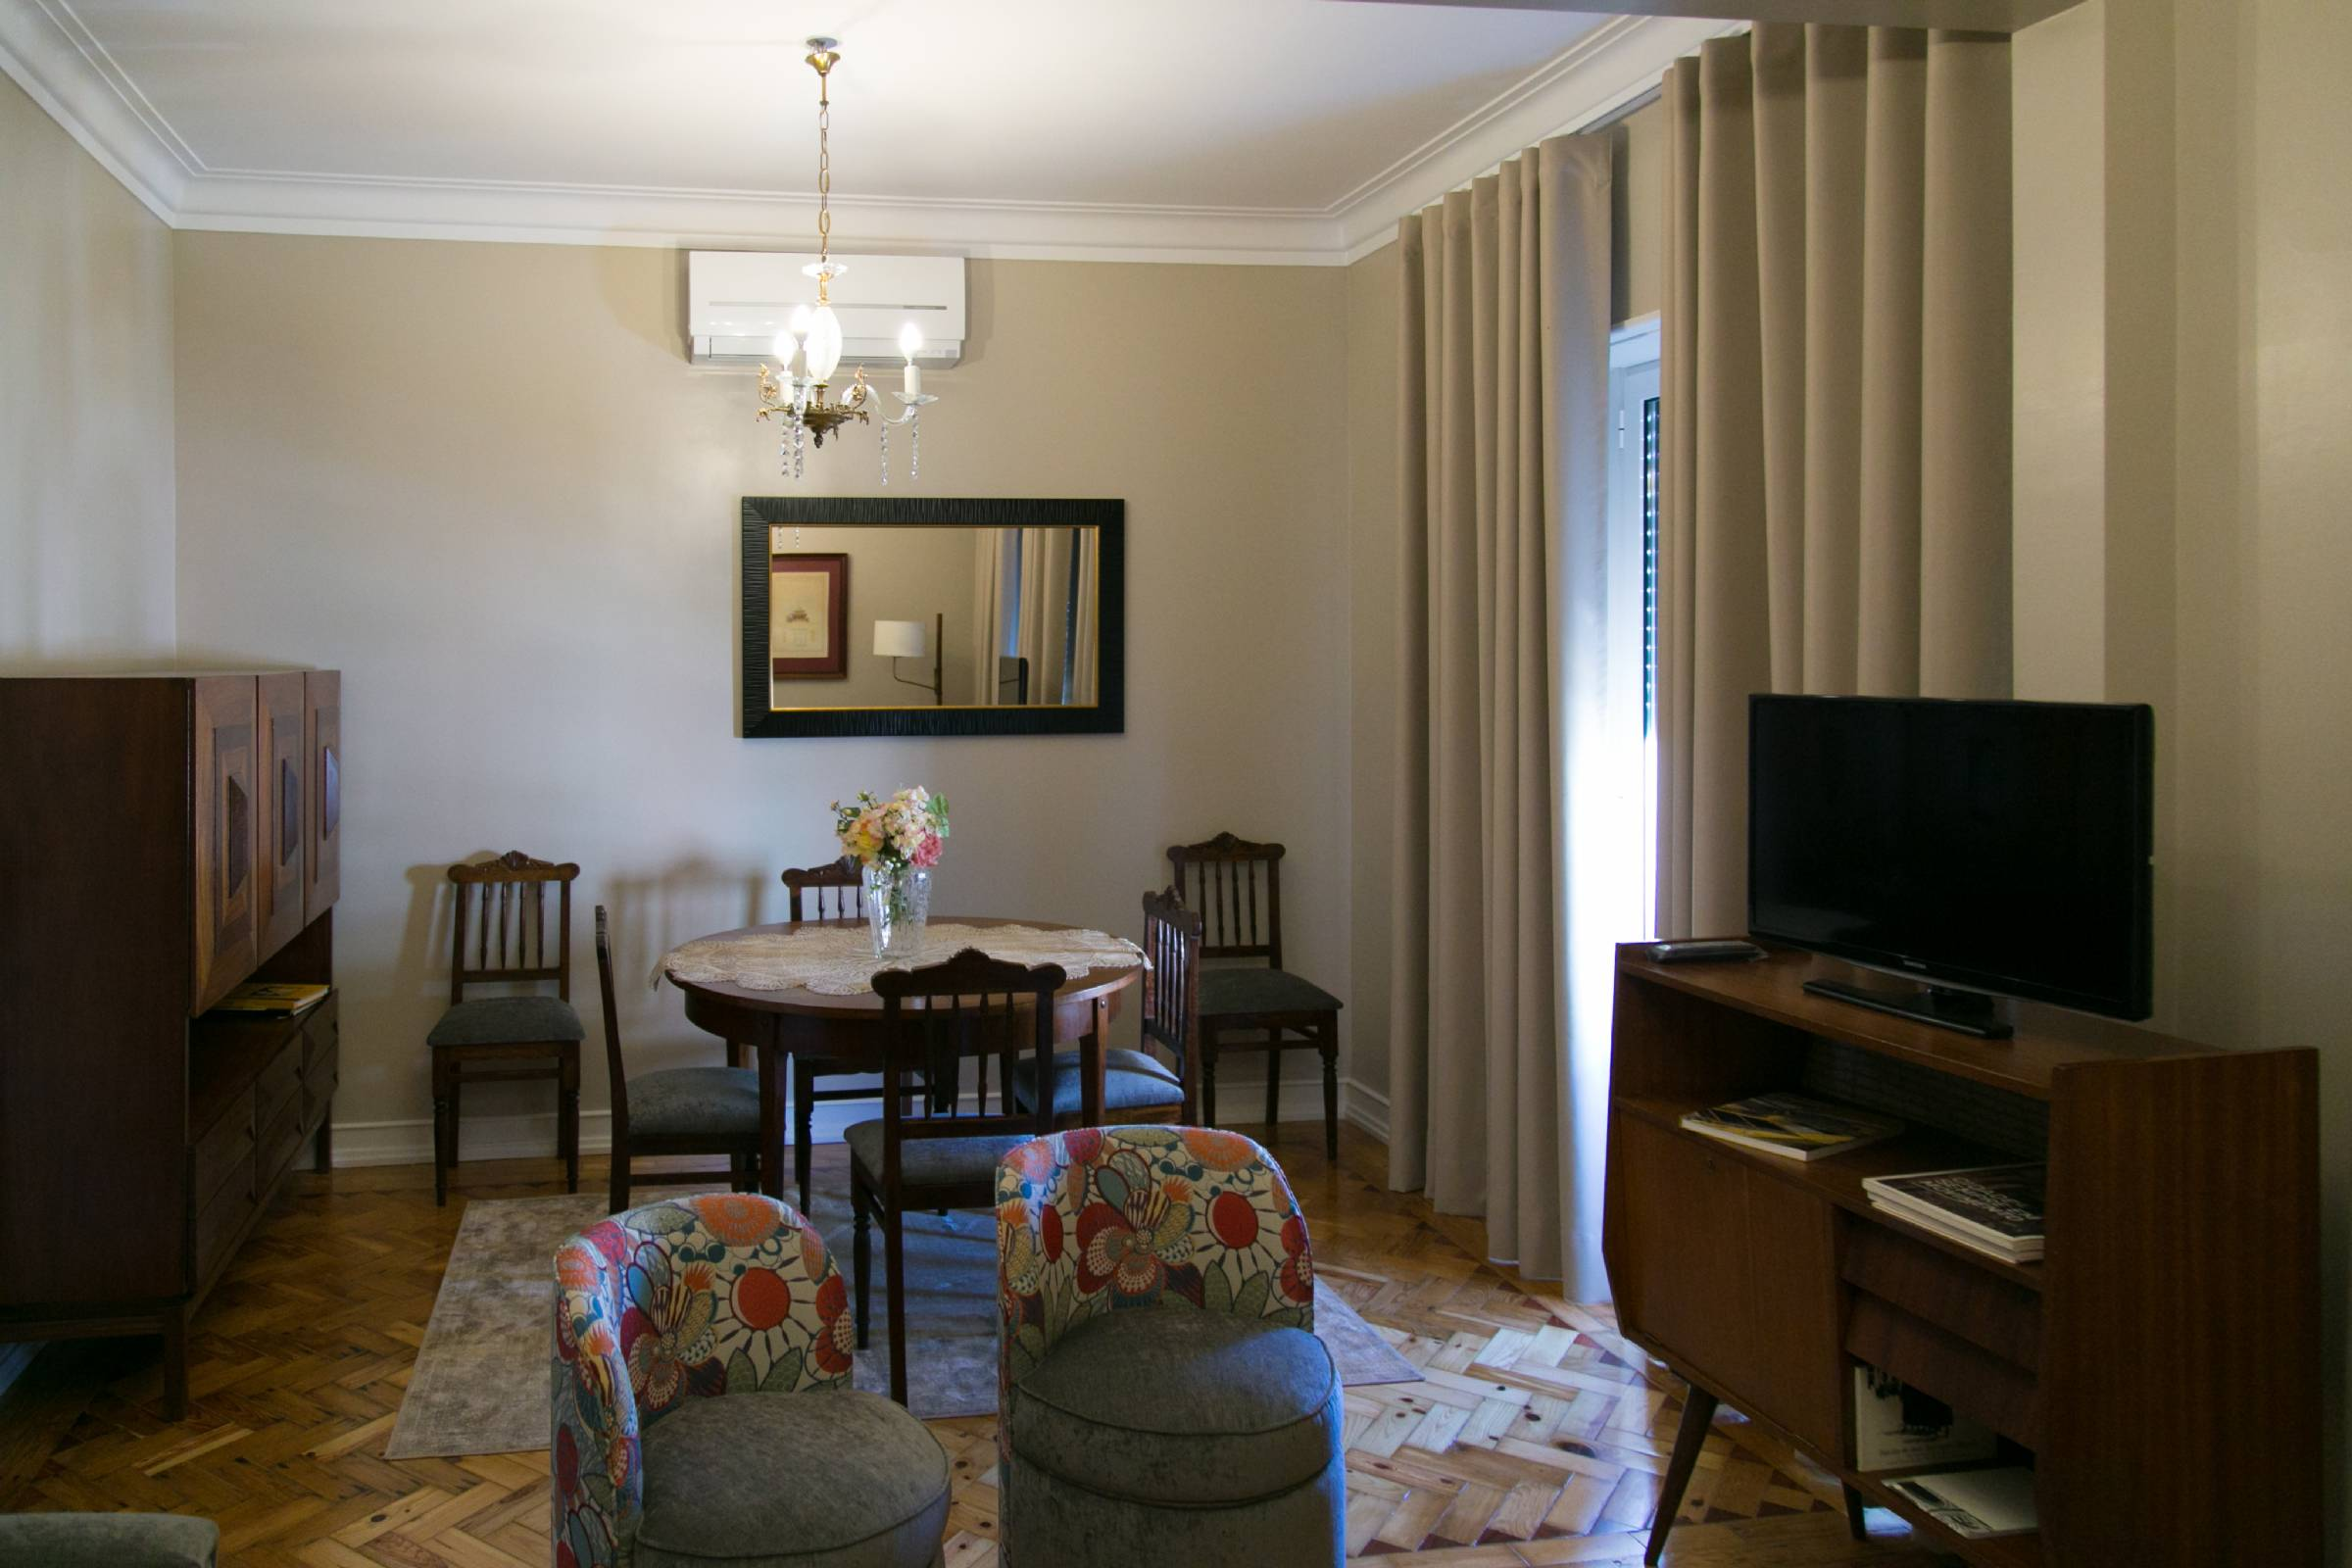 Apartamento - Campolide, Lisboa